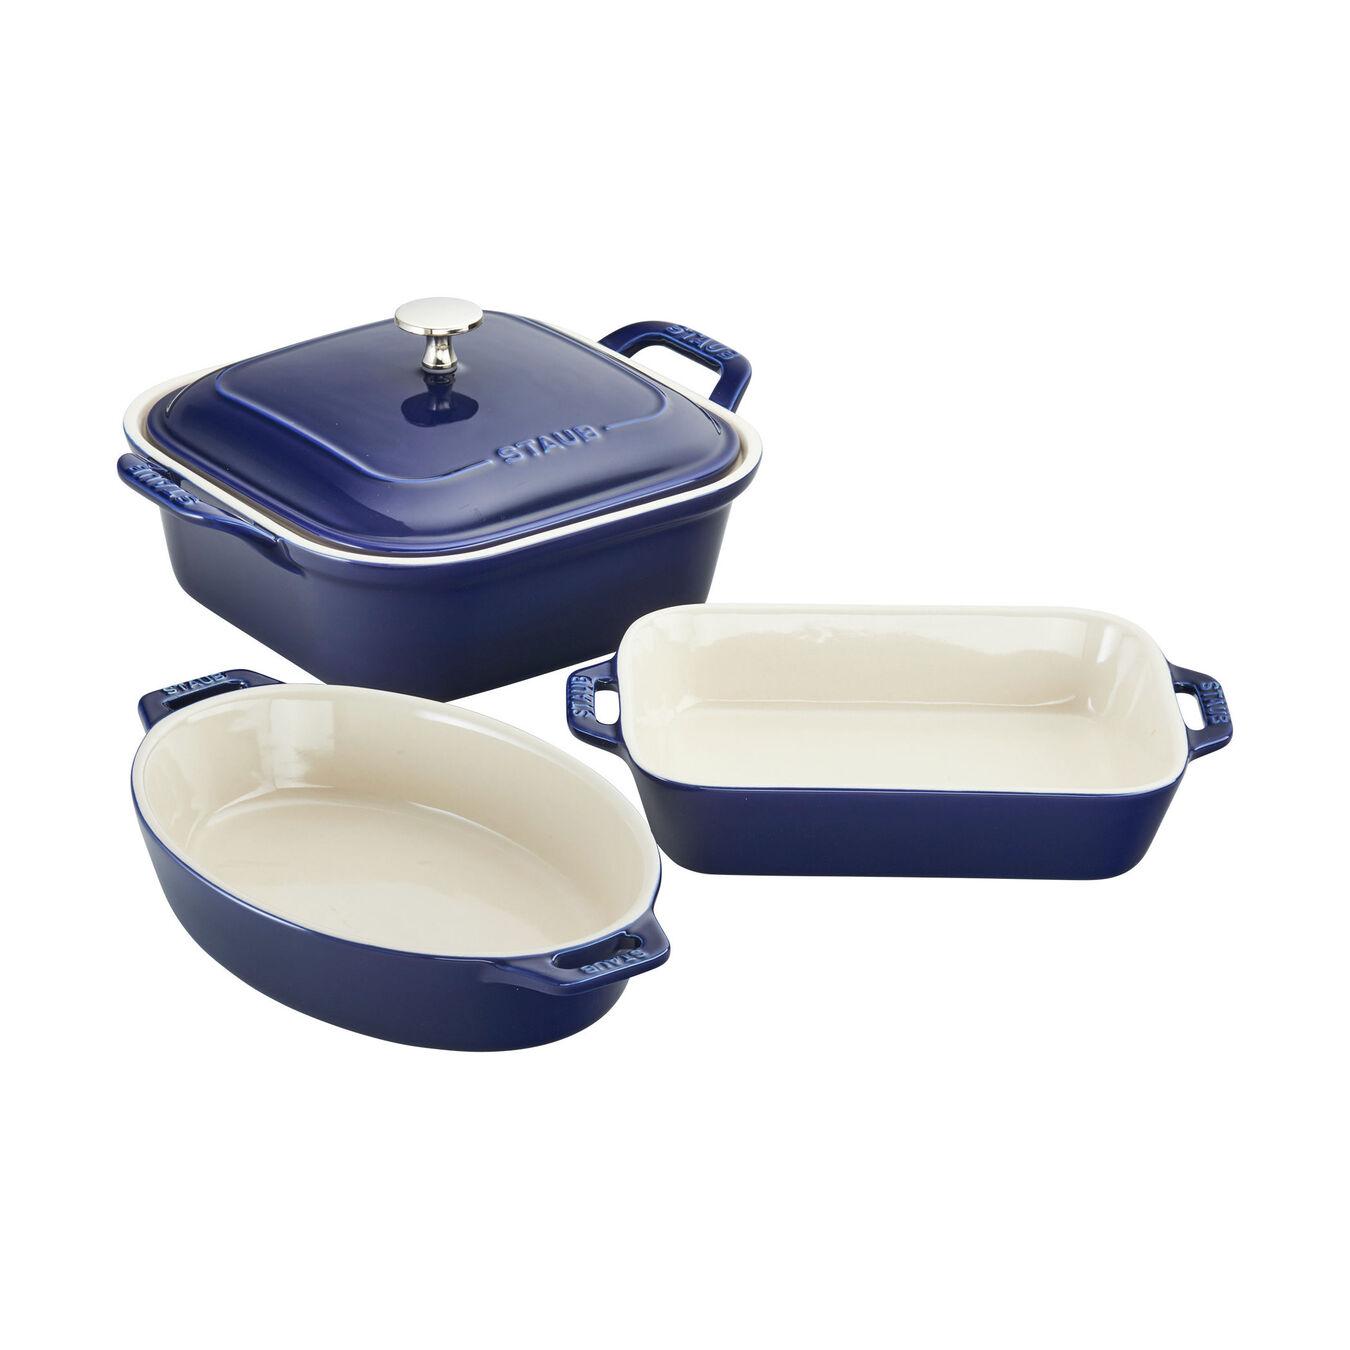 Ovenware set, 4 Piece | dark-blue,,large 2